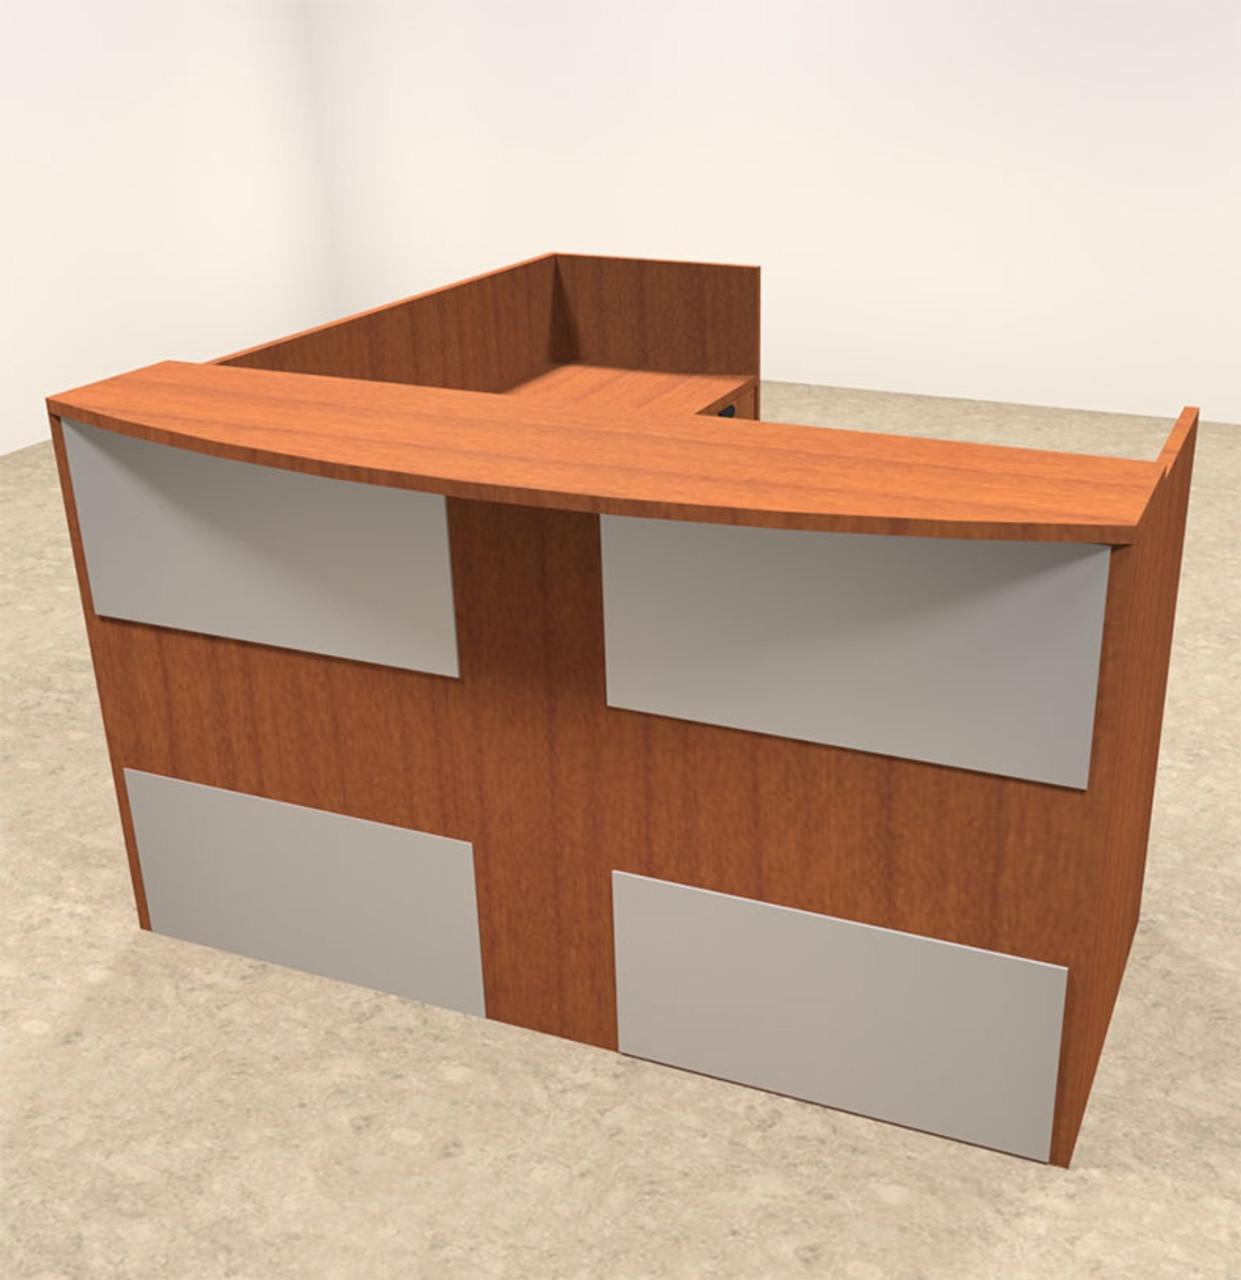 3pc L Shaped Modern Acrylic Panel Office Reception Desk, #OT-SUL-R21